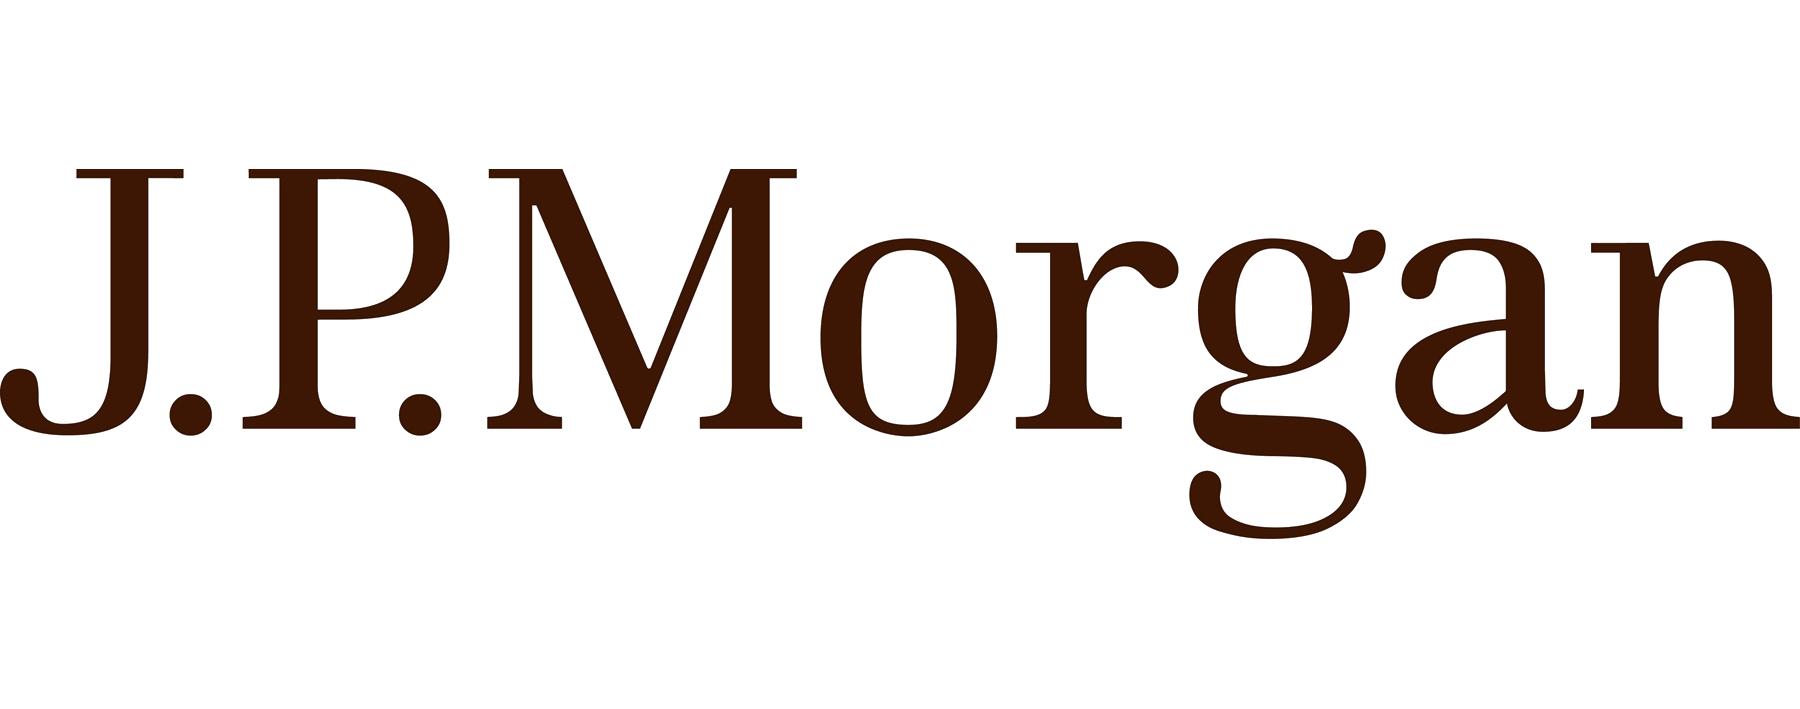 JPMorgan Chase Wave Analysis – 24 October, 2019